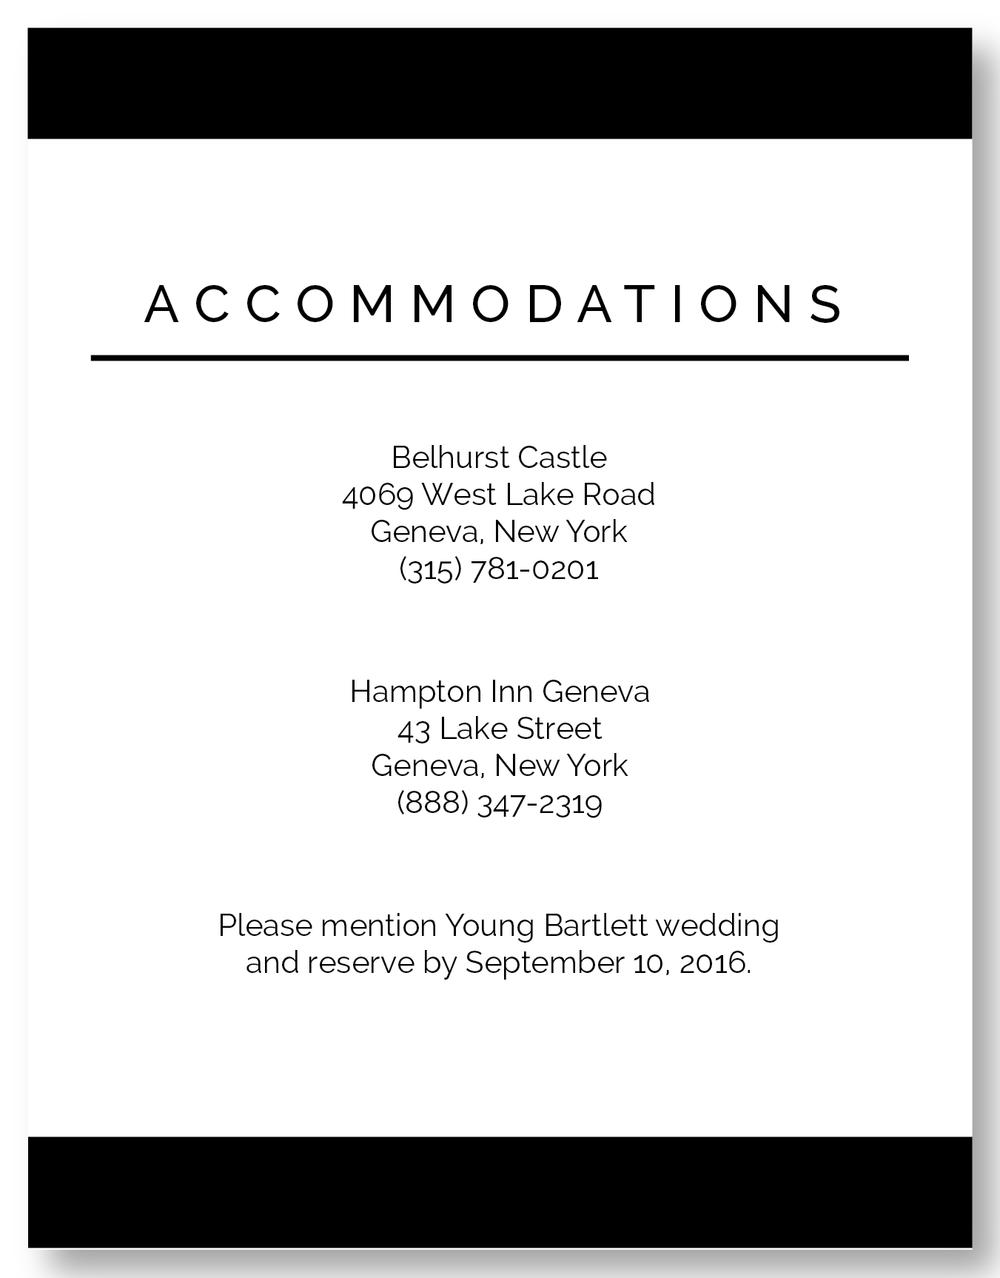 The Geneva - Accommodation Card